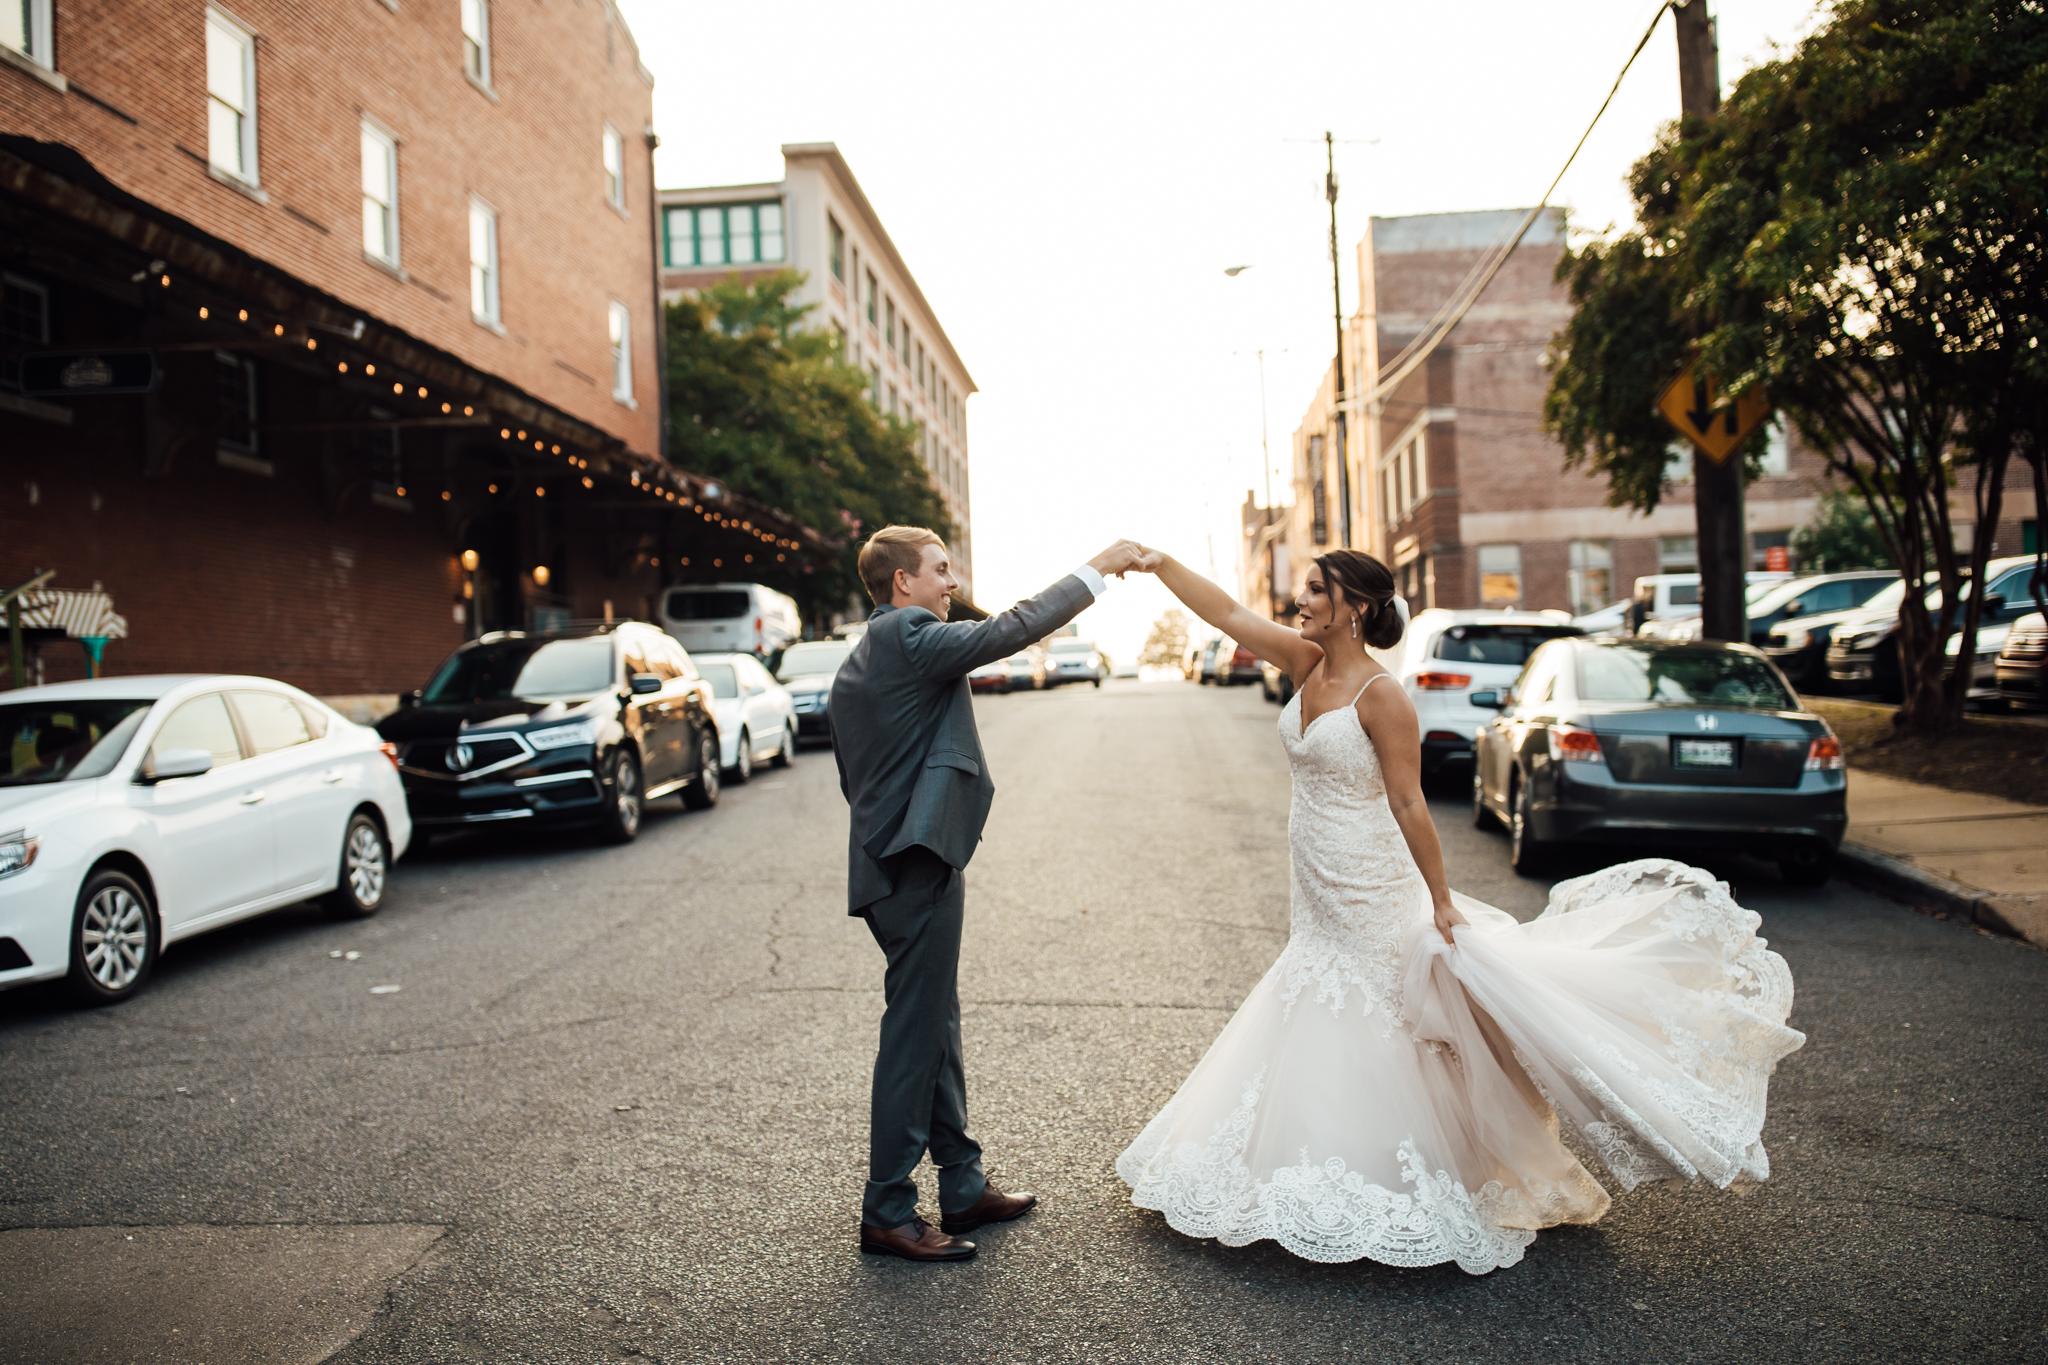 409smain-downtown-memphis-wedding-venue-thewarmtharoundyou (116 of 243).jpg